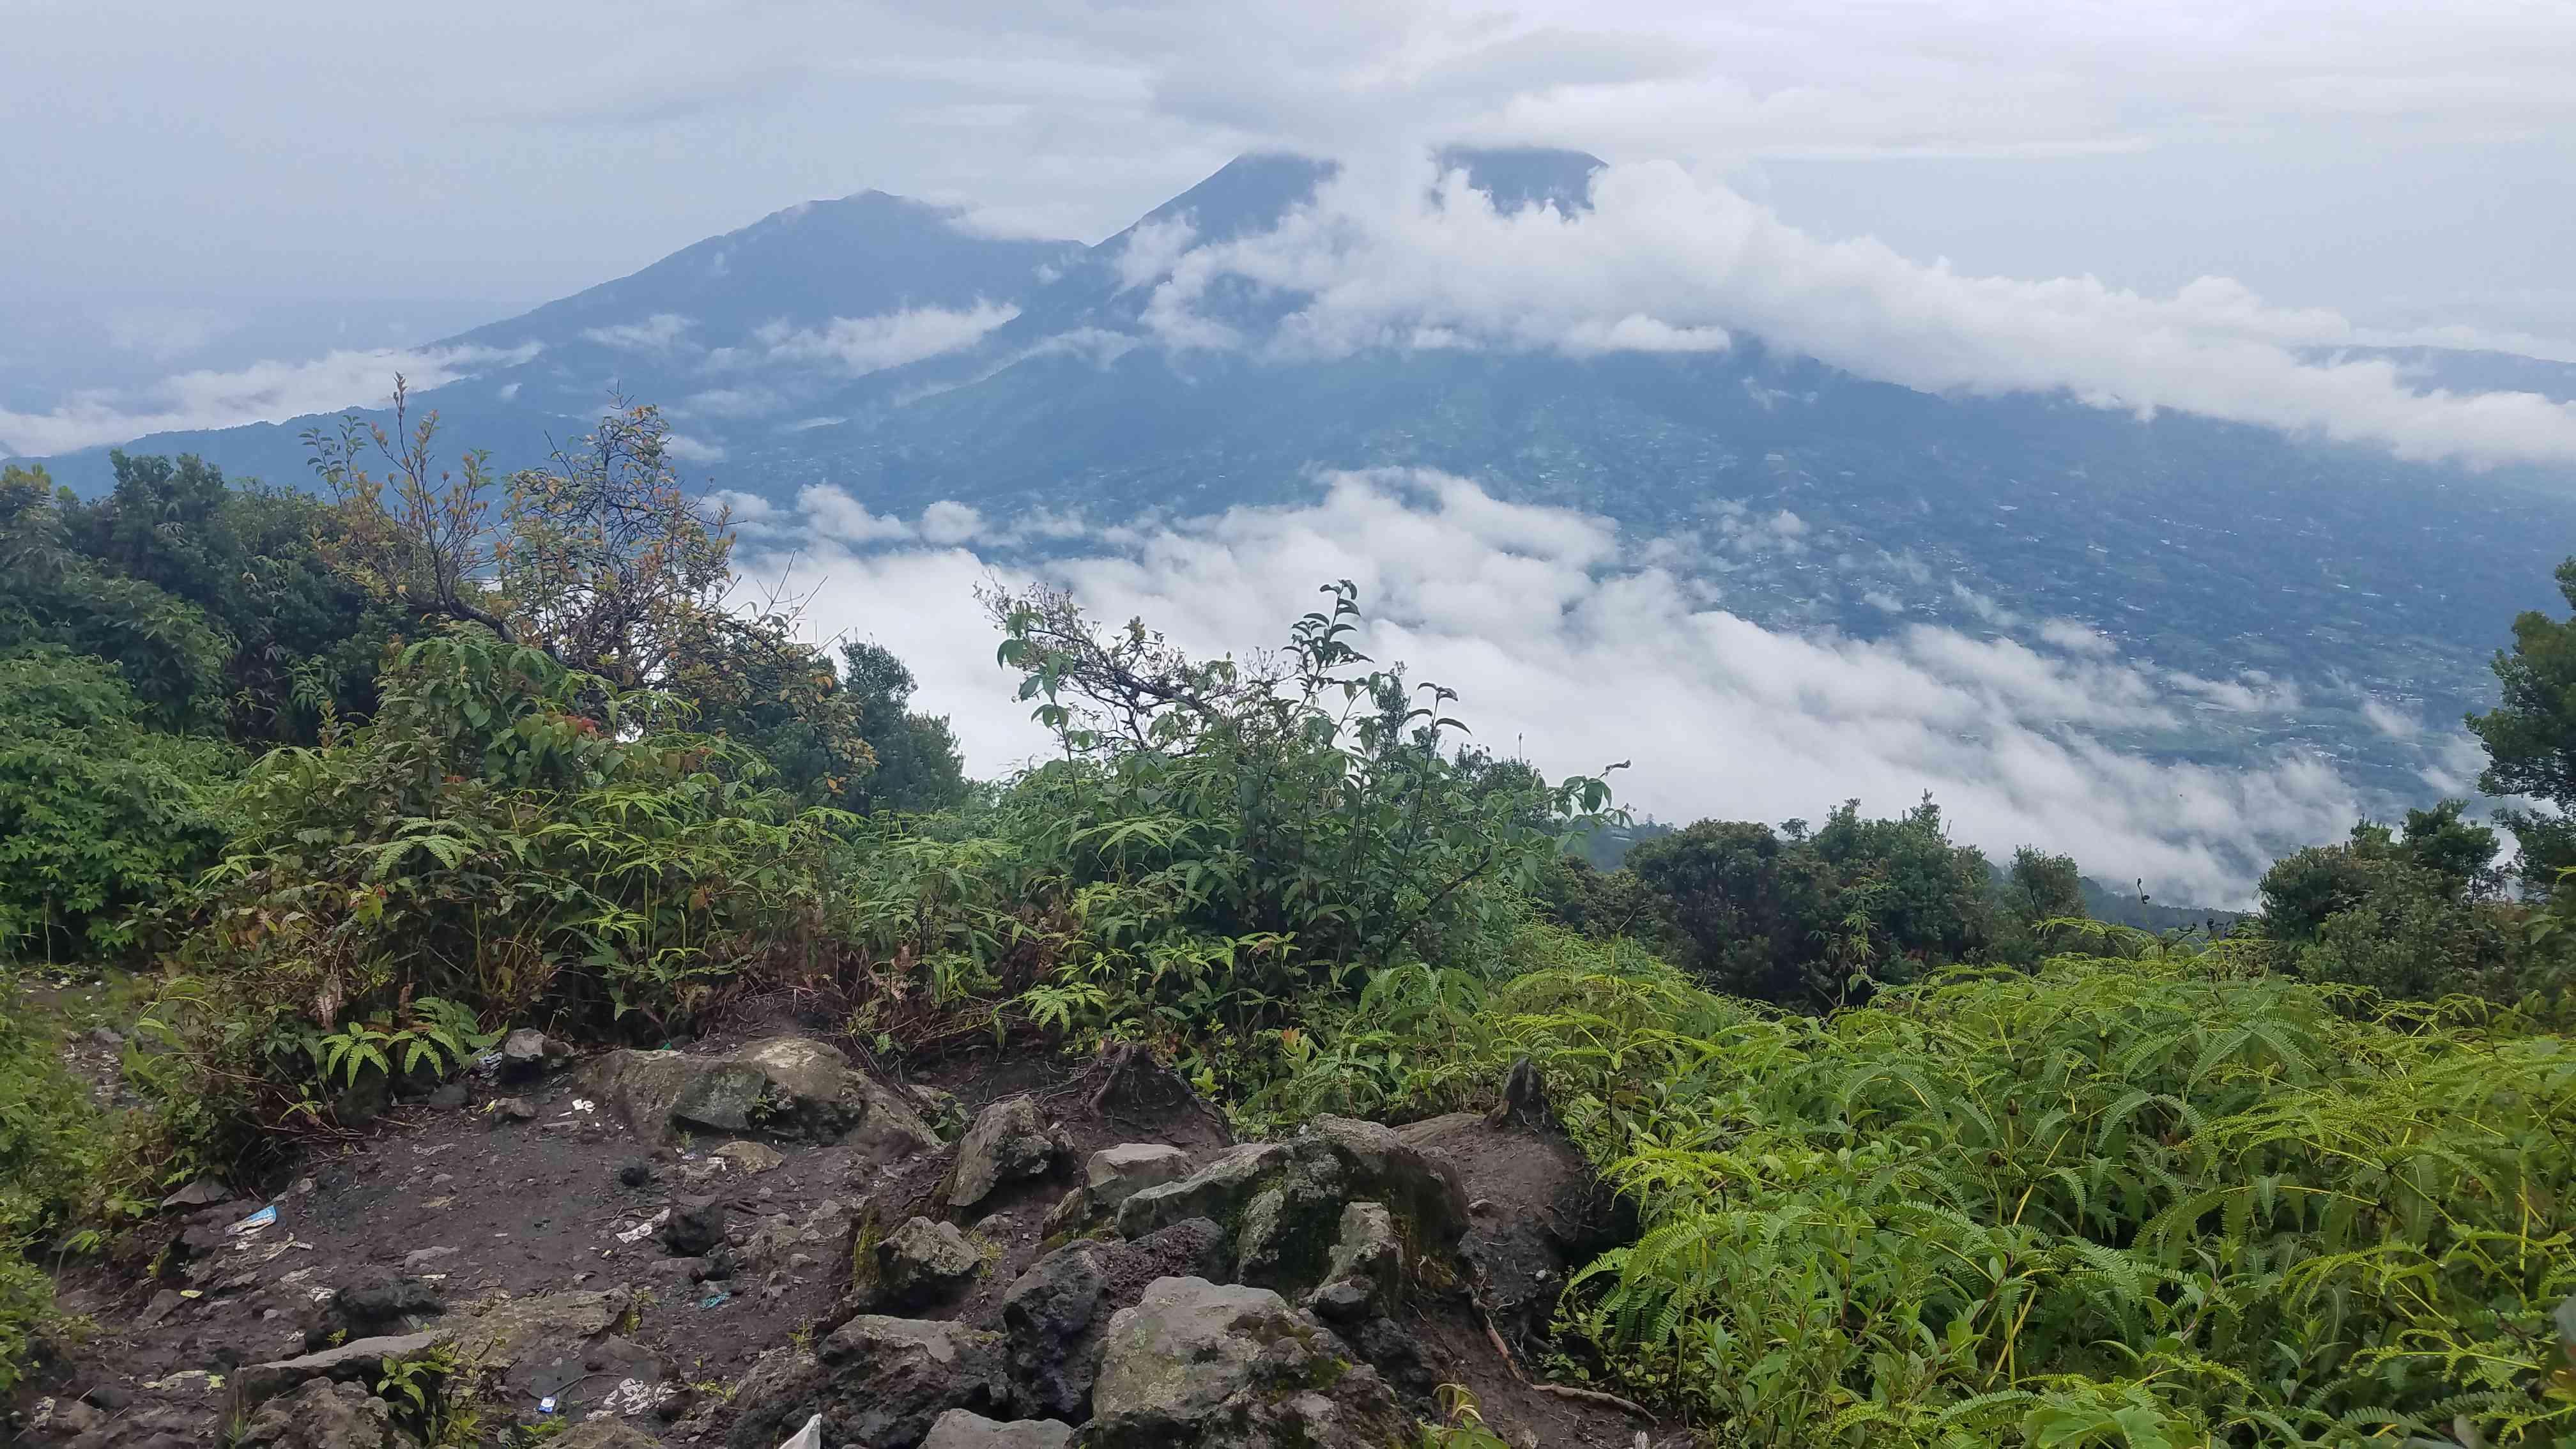 Gunung Marapi, a volcano in West Sumatra